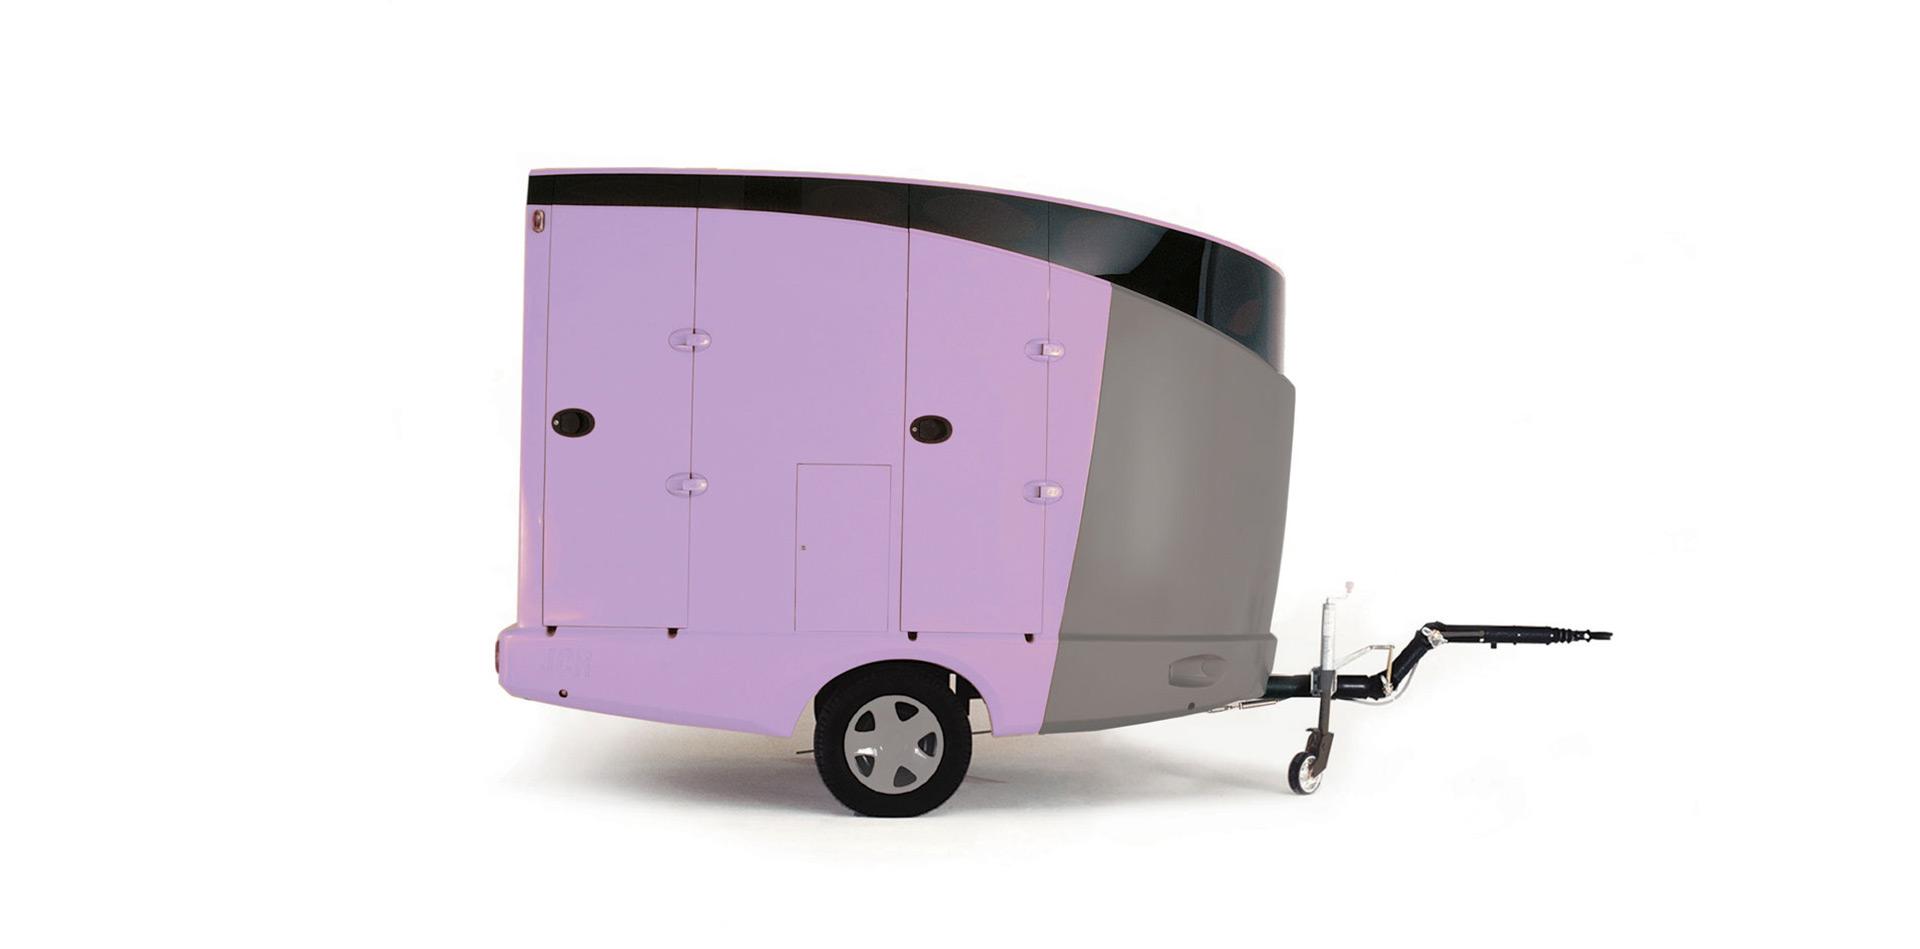 La Citadine caravane urbaine